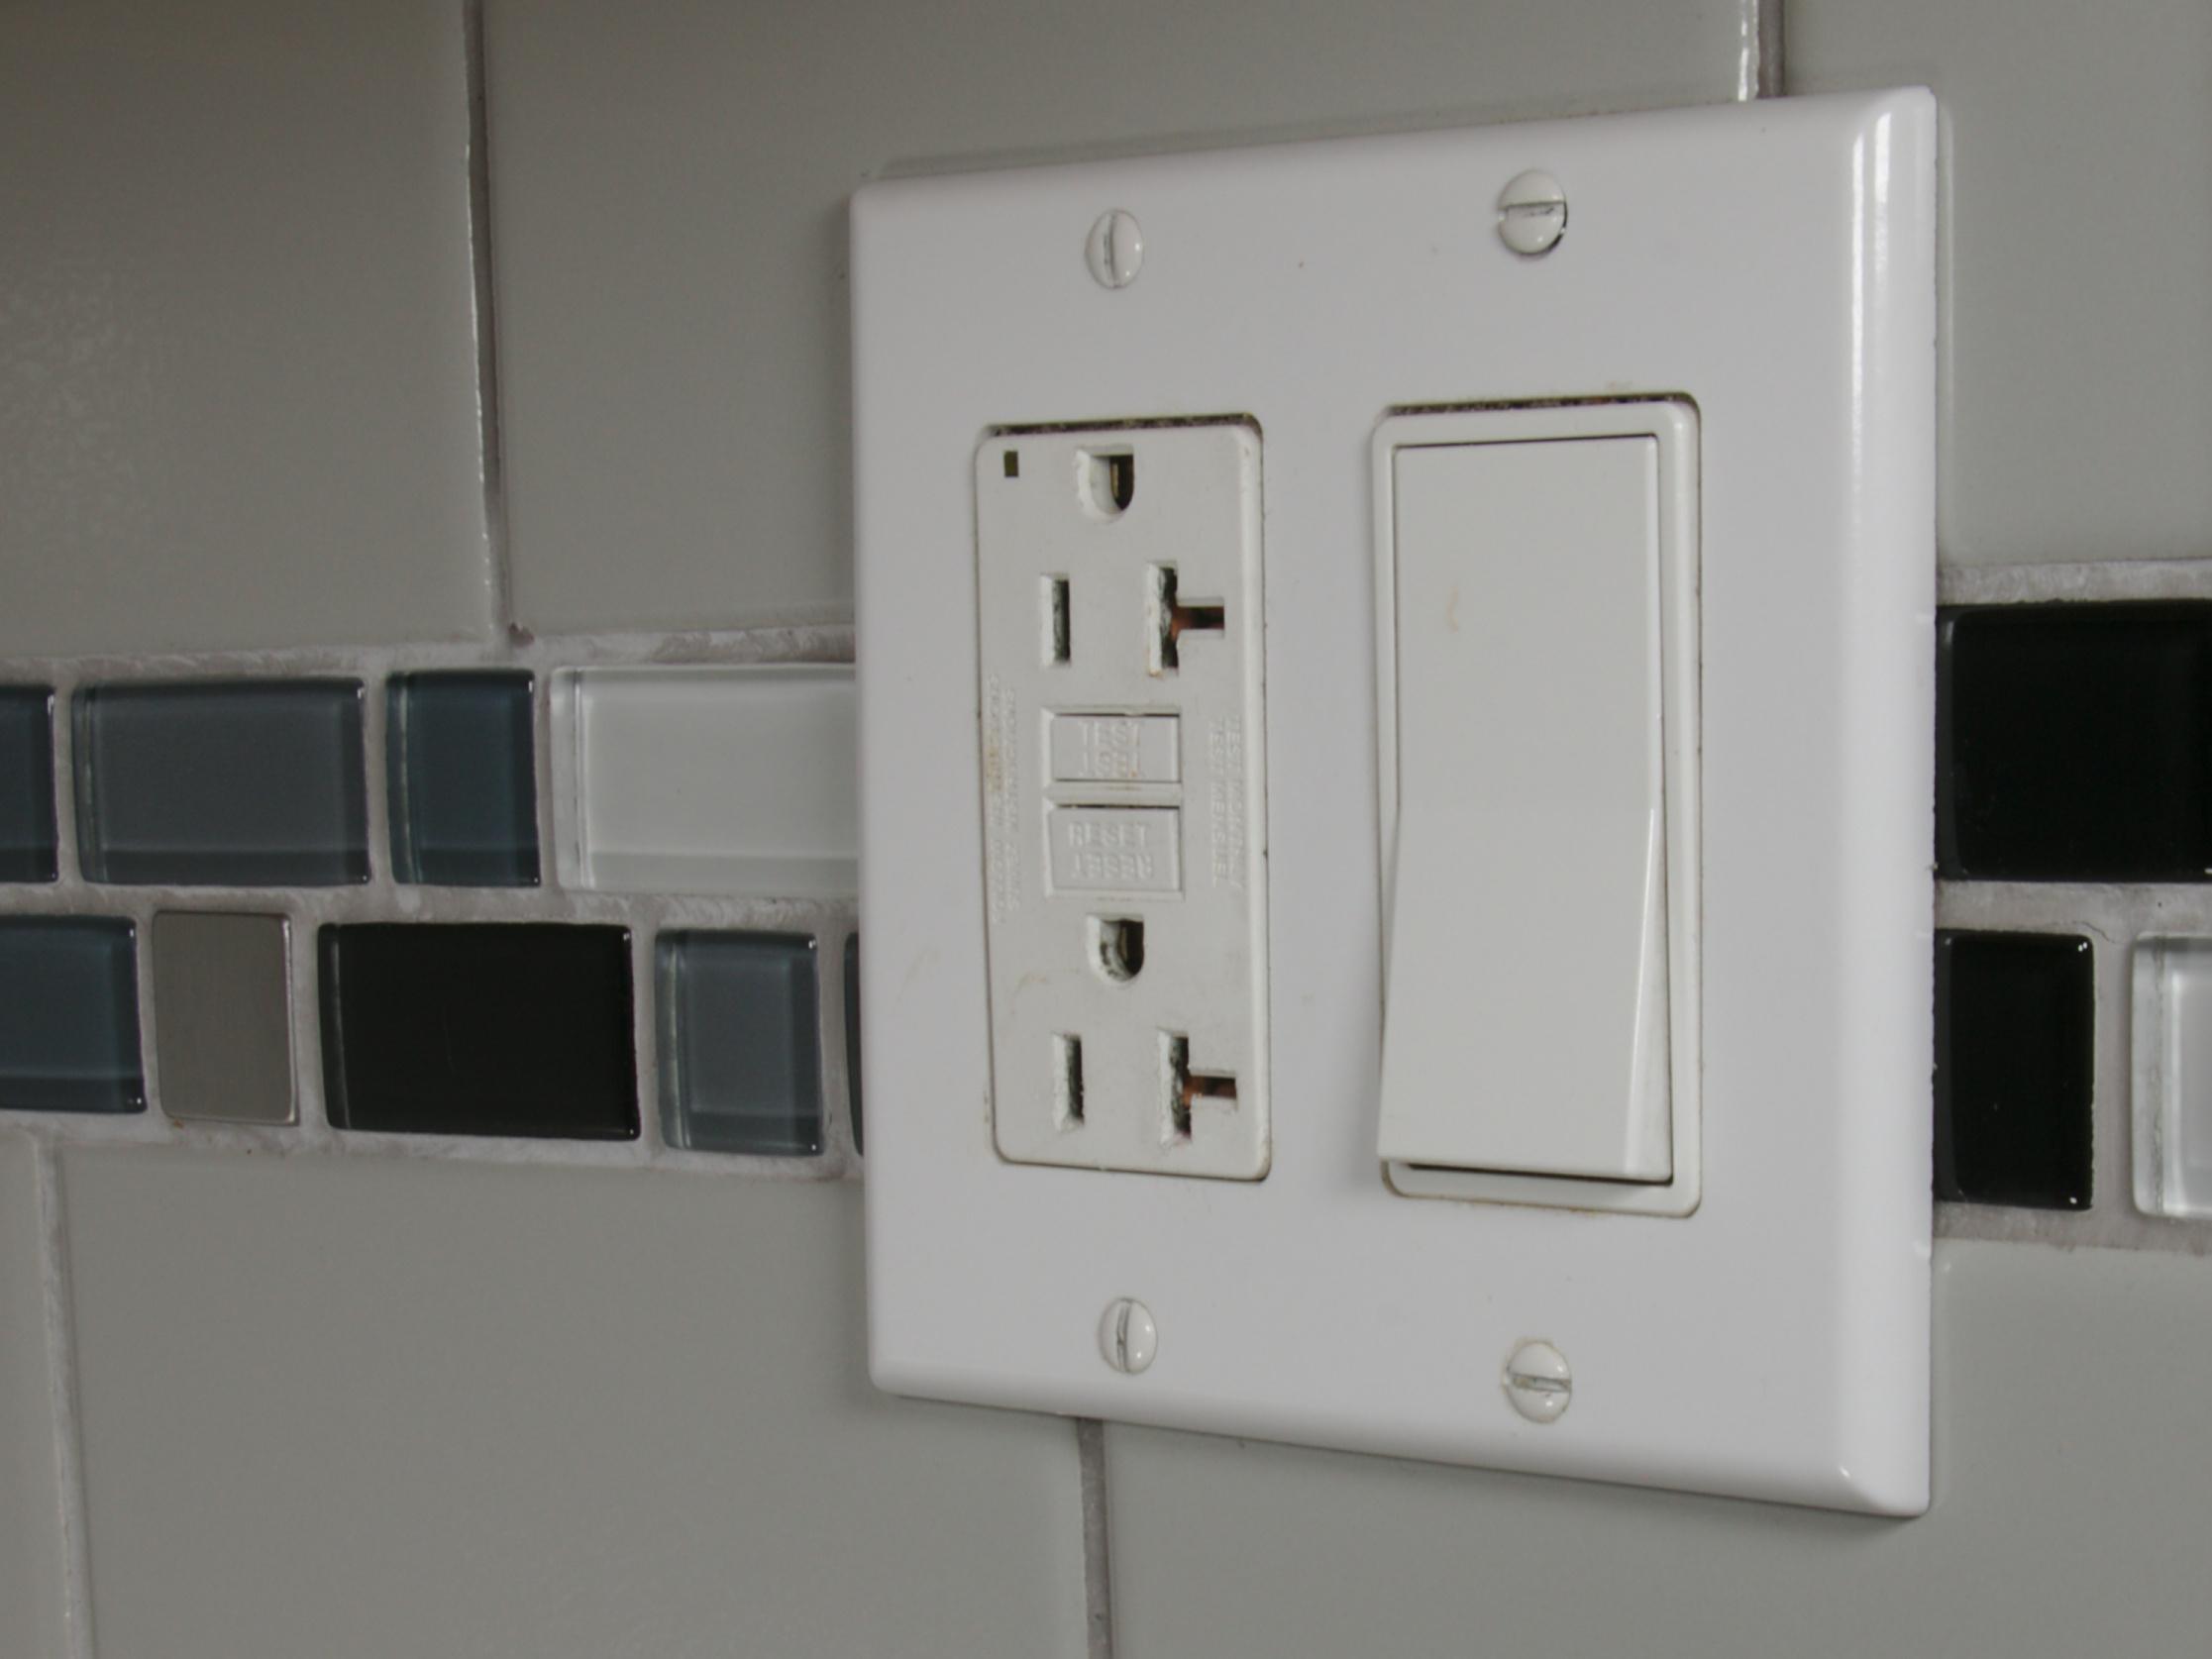 WiFi Light Switch - Thimble Learning Platform